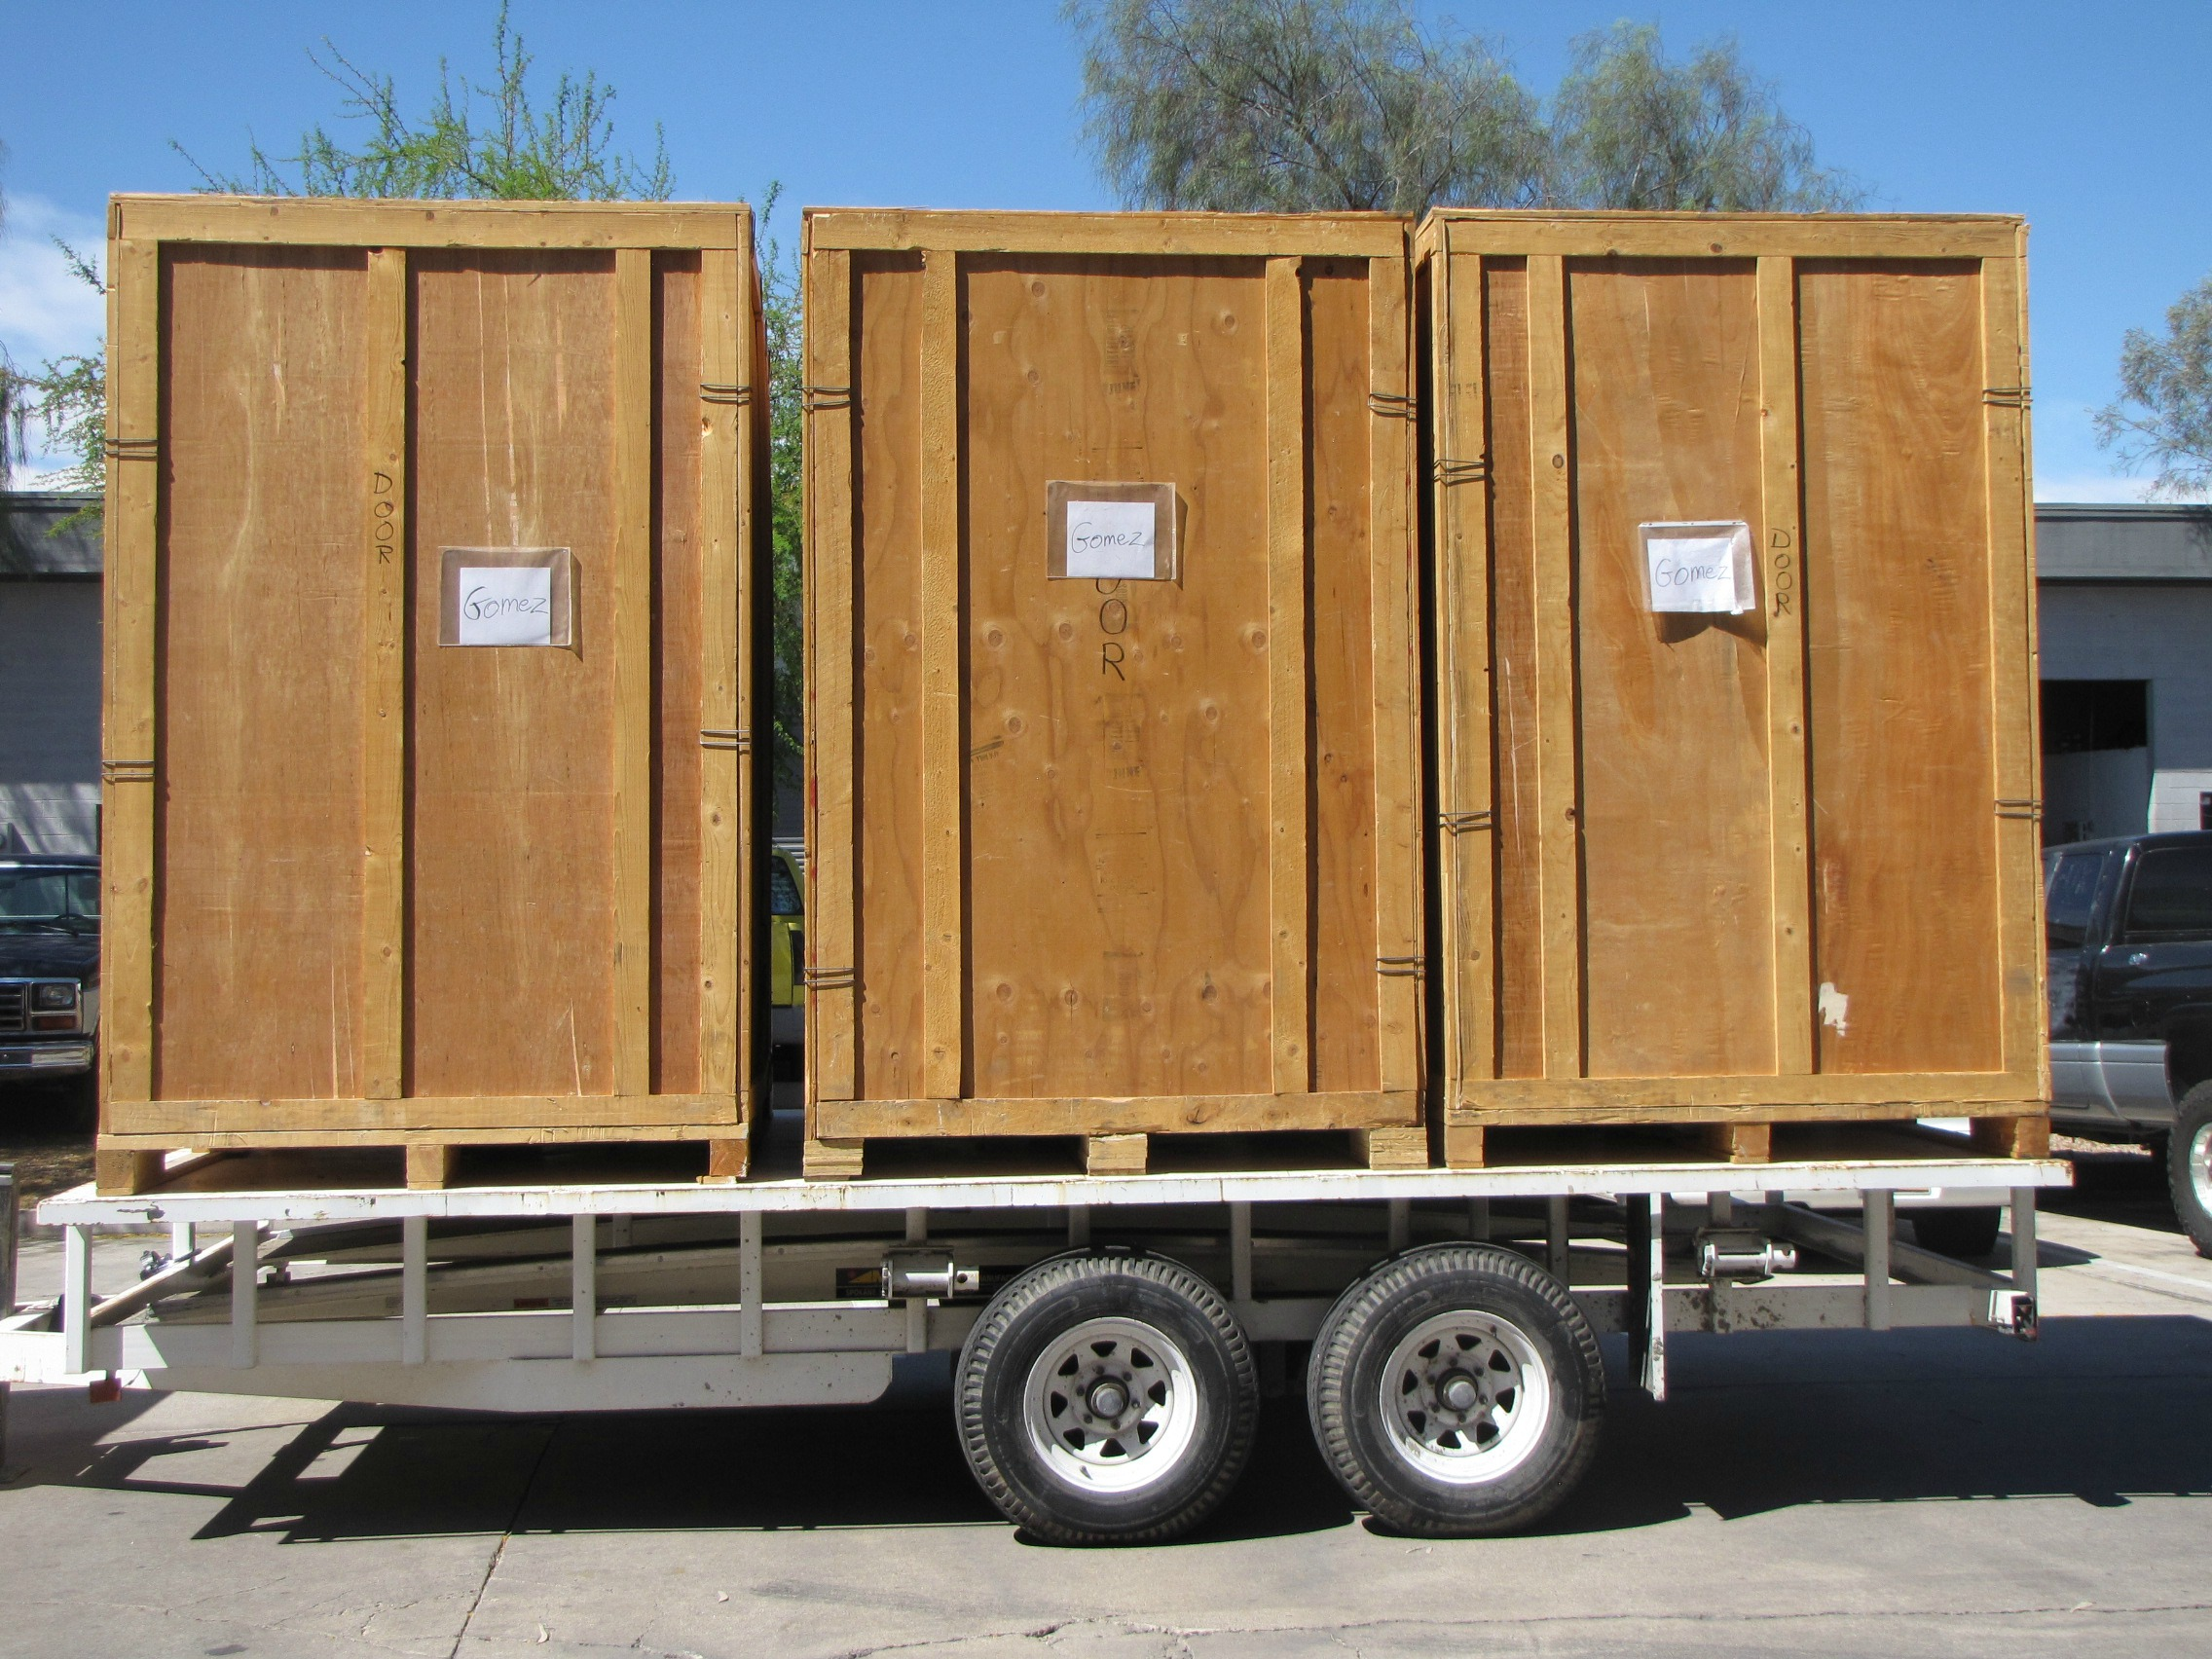 Three Crates On Trailer